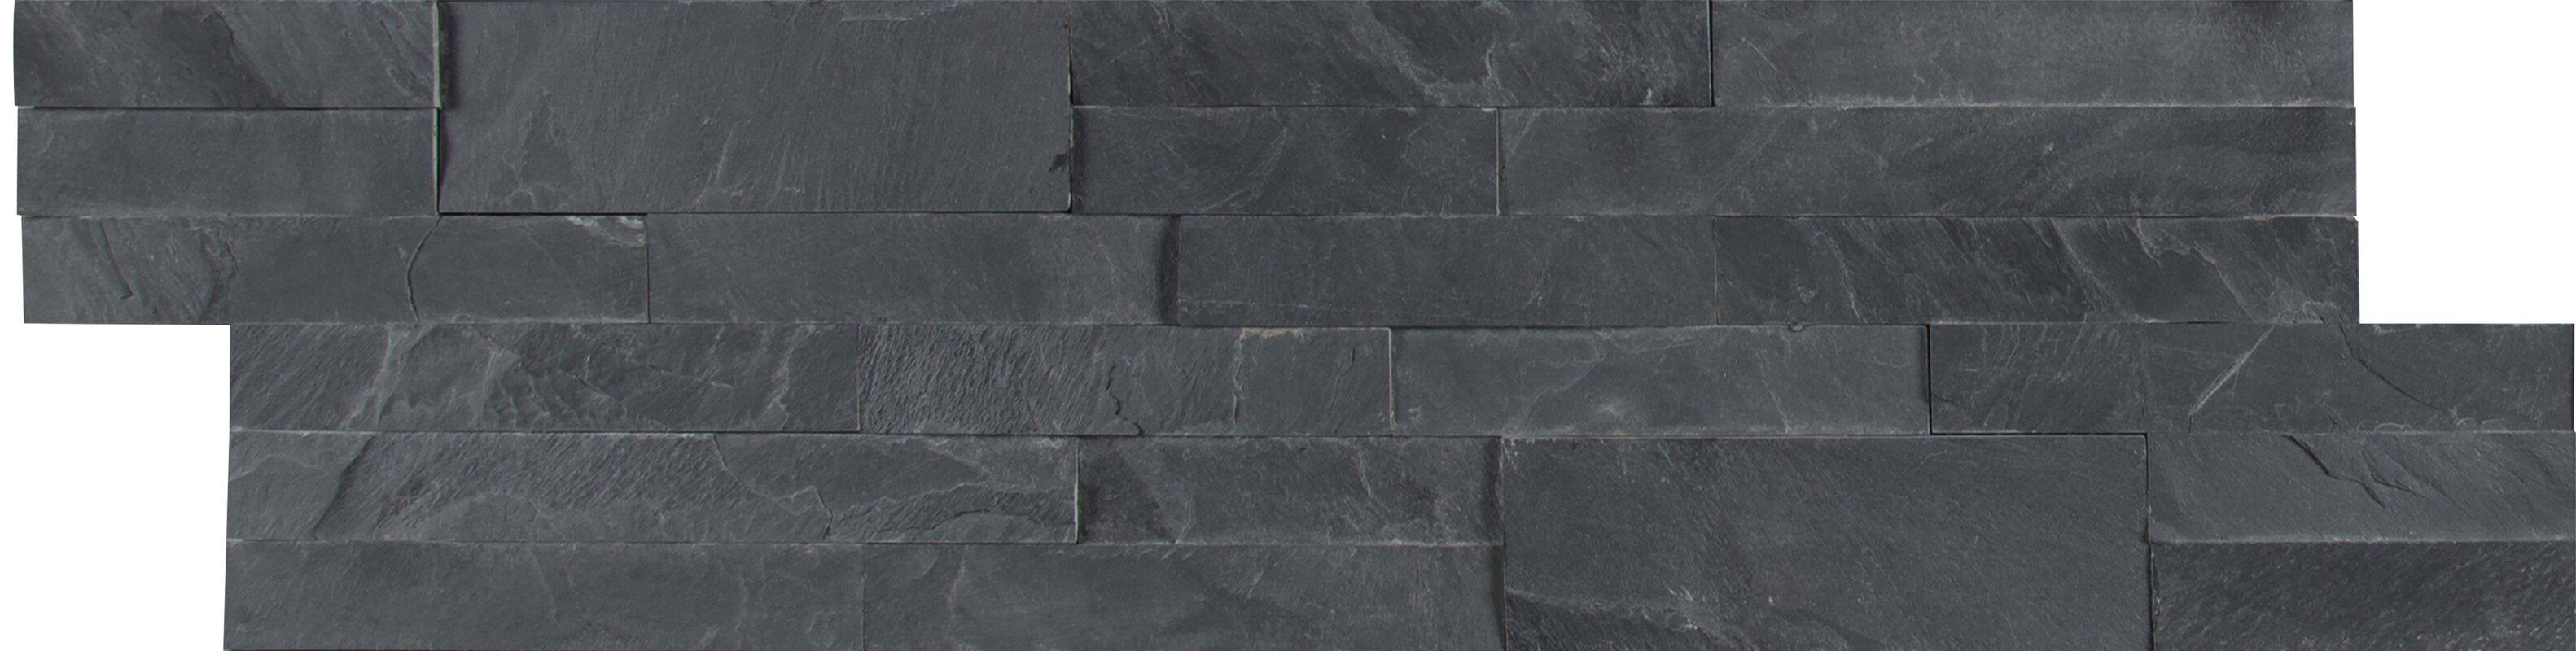 MSI Midnight Ash Veneer Peel and Stick Natural Slate Subway Tile in